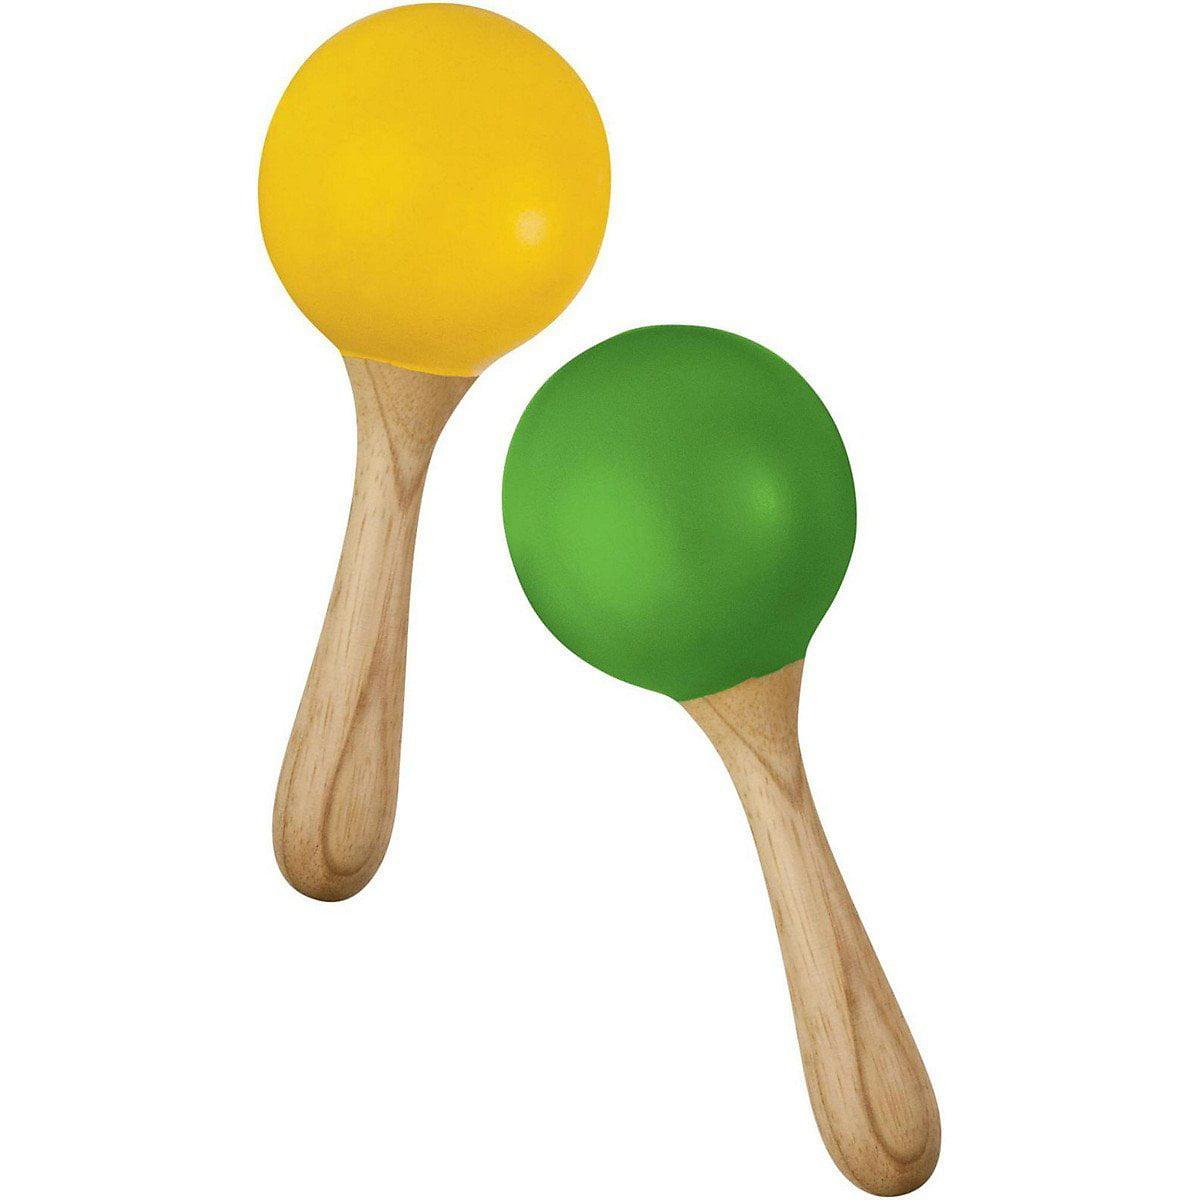 Hohner Green Tones Egg Maracas by Hohner